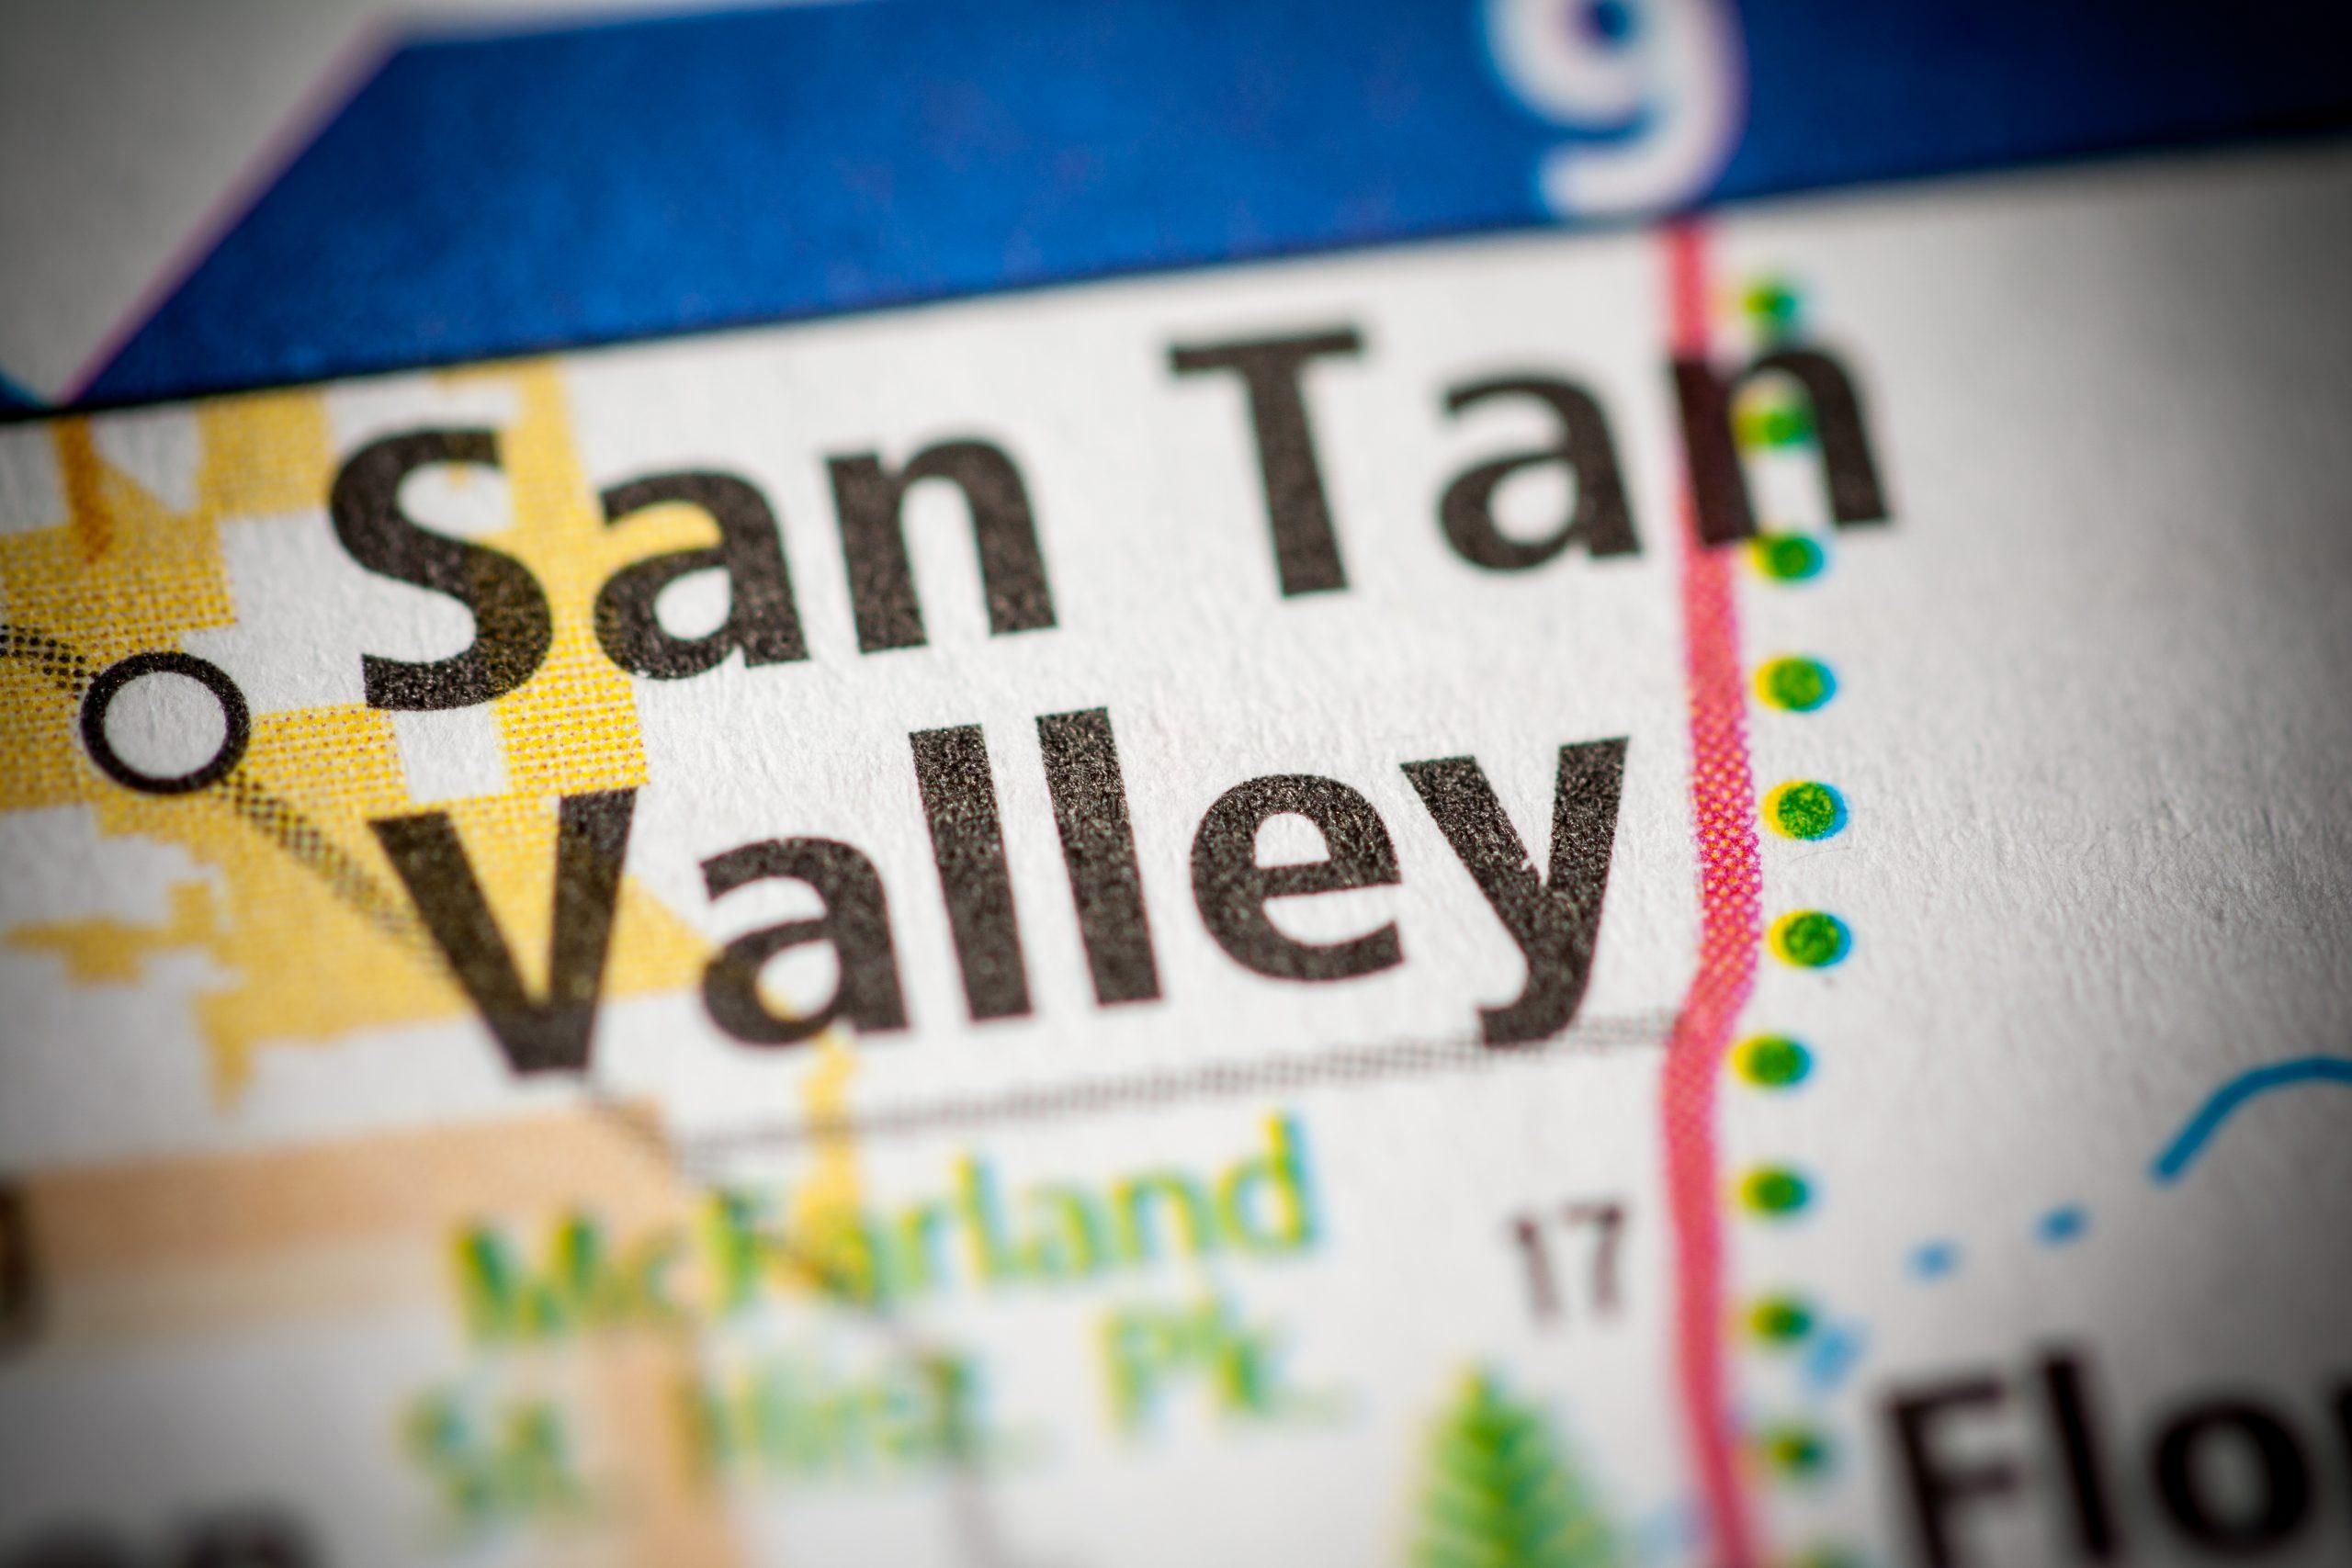 Fun Things To Do in San Tan Valley